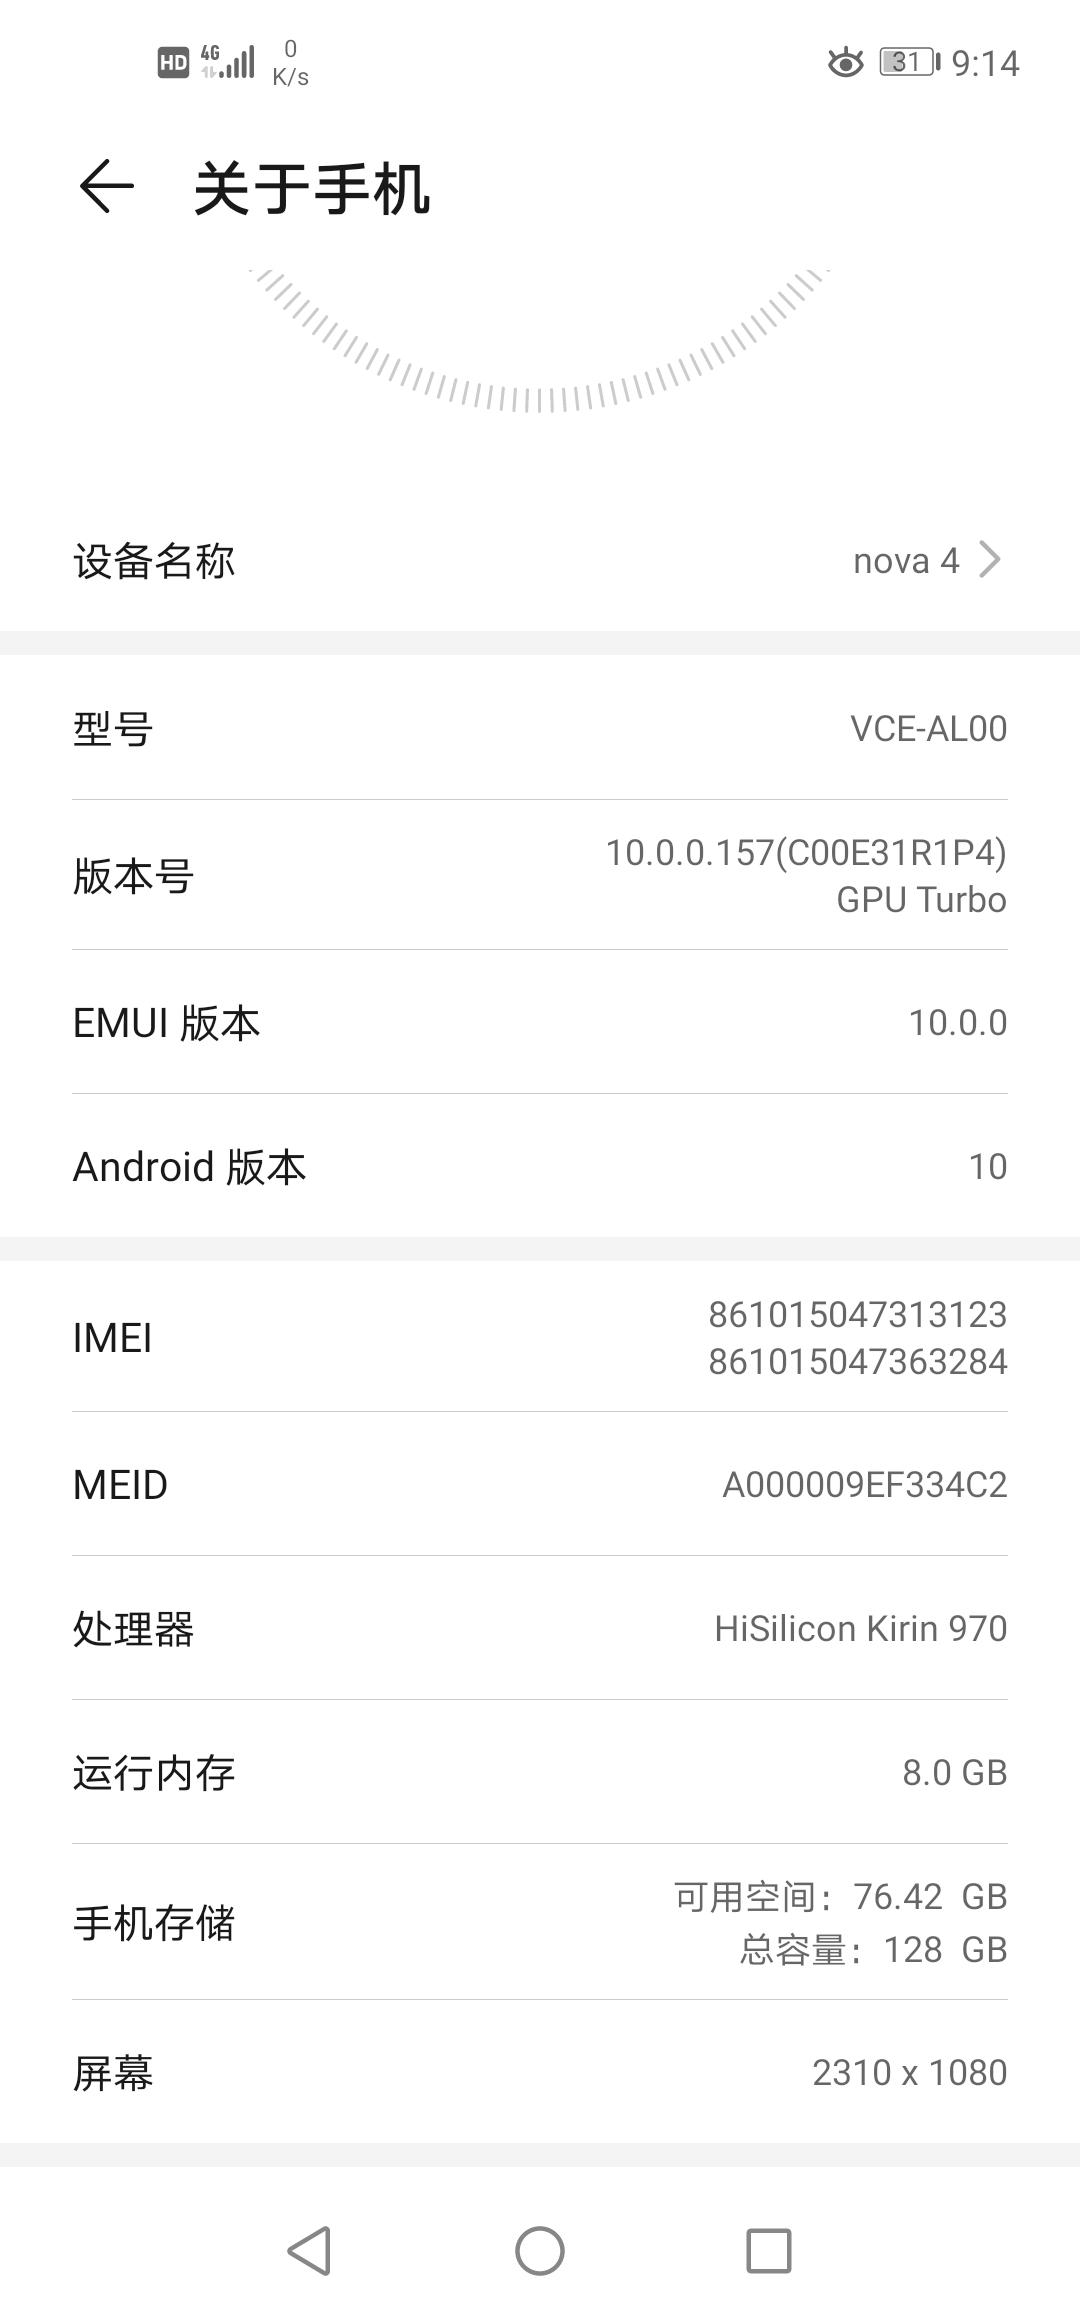 Screenshot_20200510_211427_com.android.settings.jpg